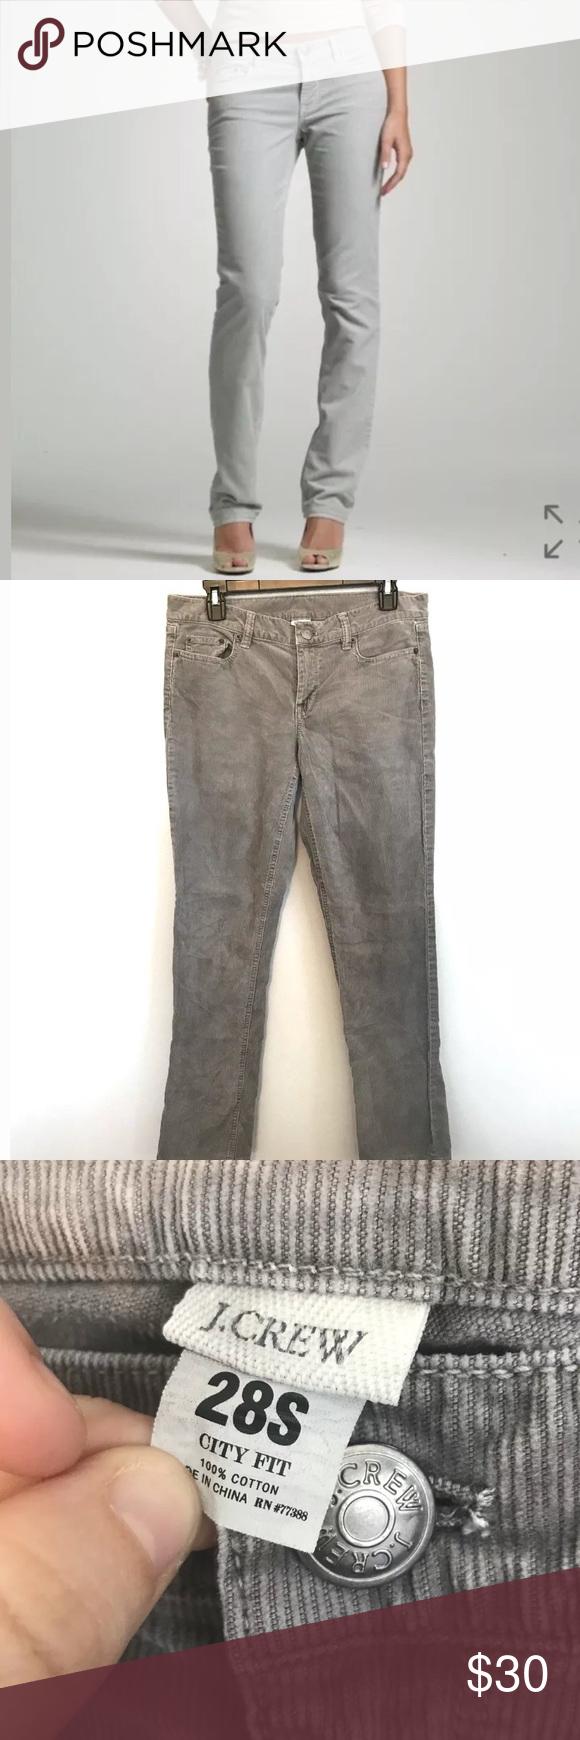 0bdbd4b27e9e J Crew Size 28 Short Vintage Skinny Corduroy Pant J. Crew Size 28 Short  Gray Vintage Matchstick Skinny Leg Corduroy City Fit Style 28364  Approximate ...